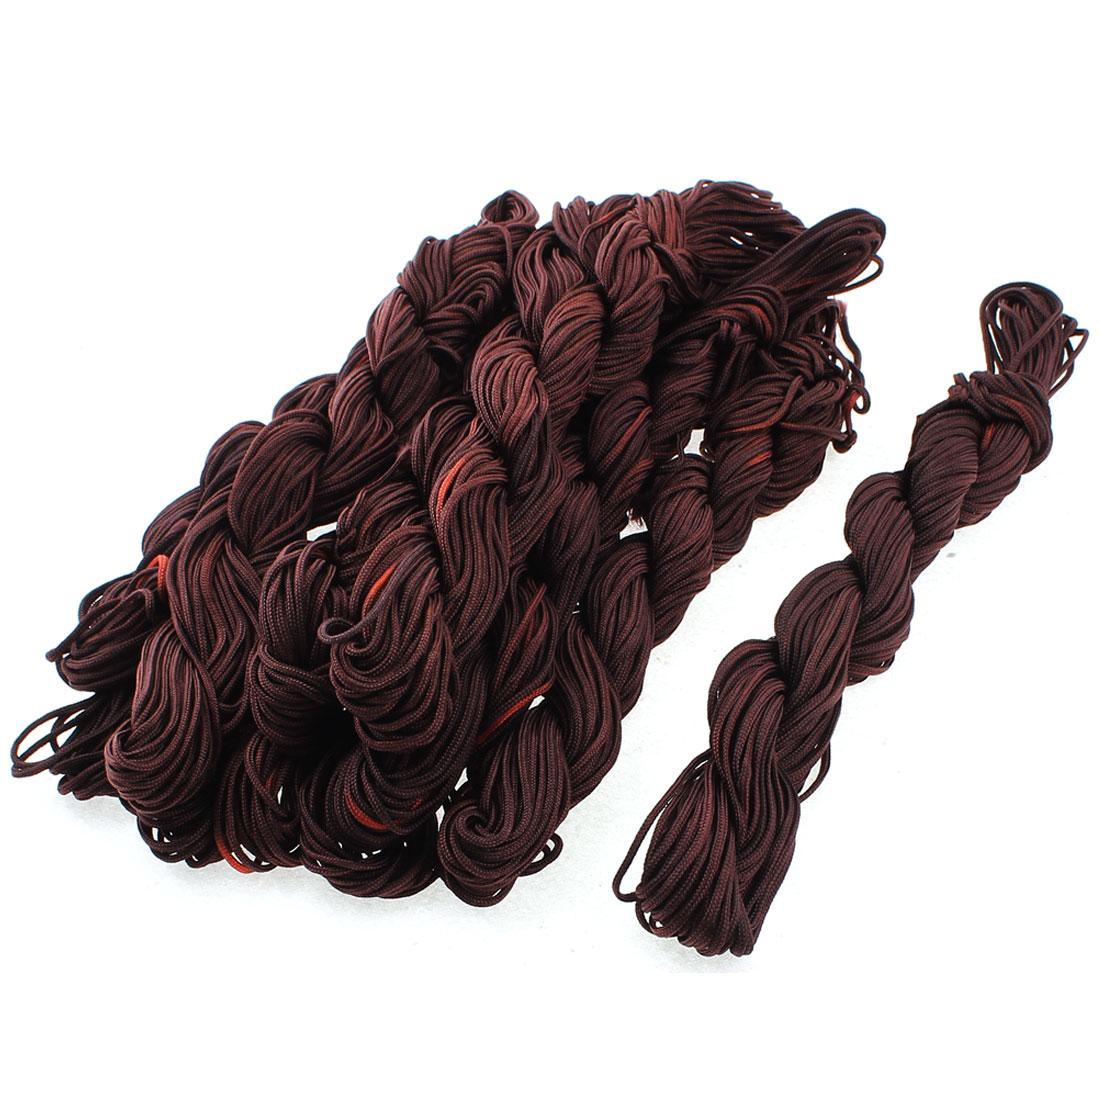 20M Length 2mm Dia Chinese Knotting Bracelet Bead Thread String Dark Brown 10pcs